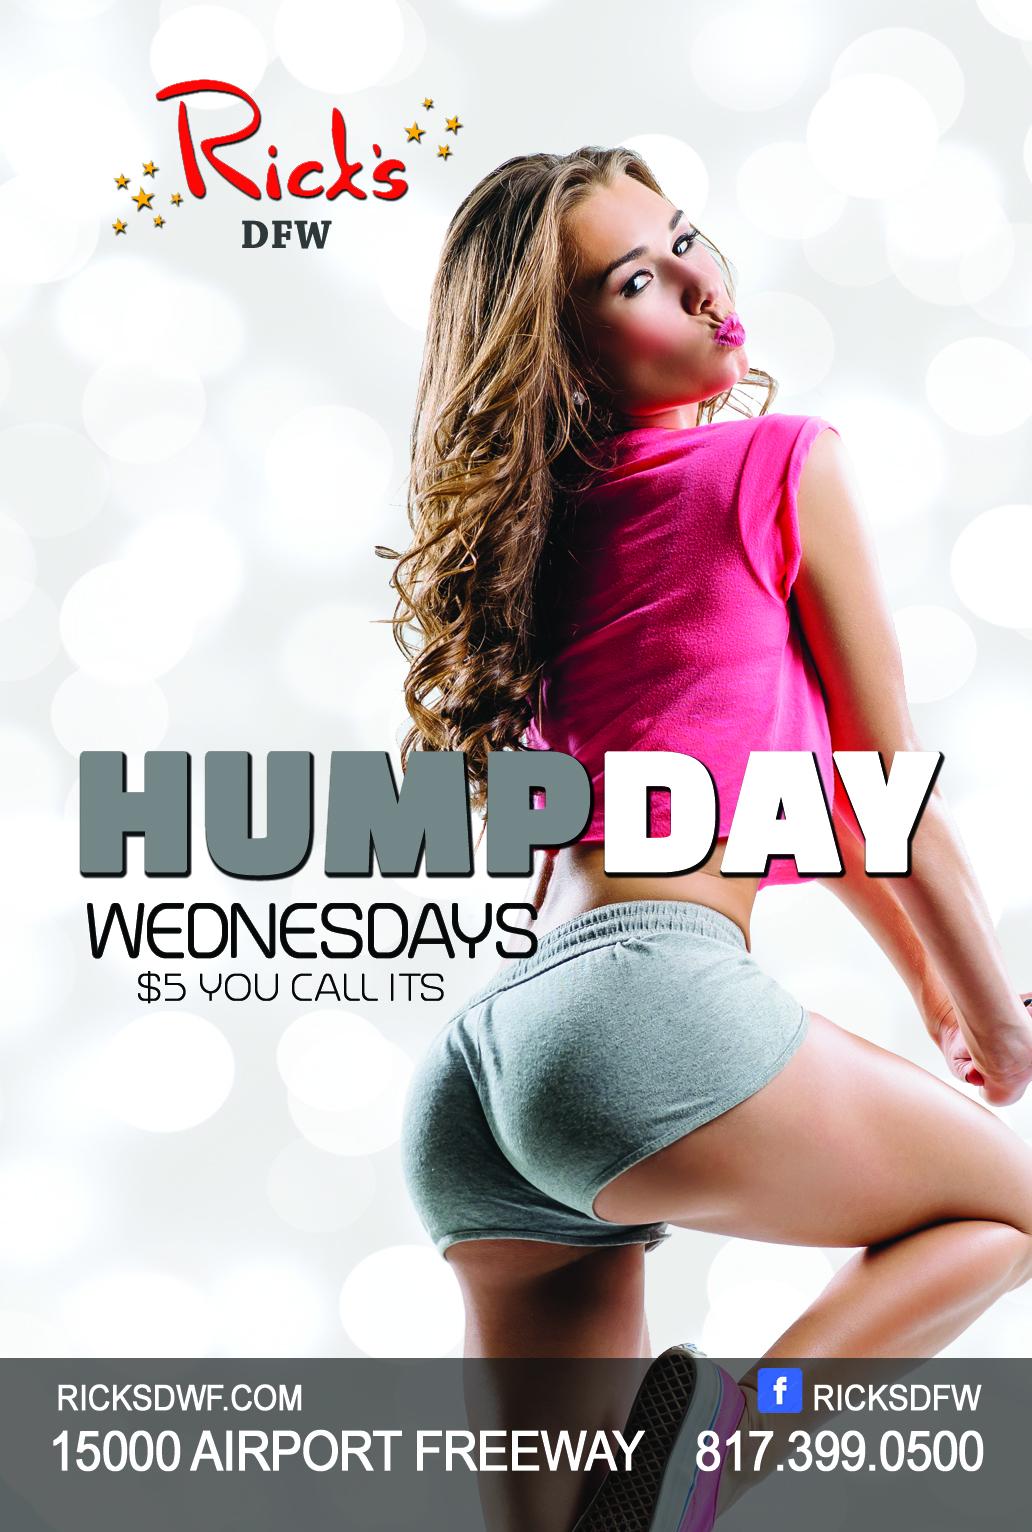 HumpDay Wednedays